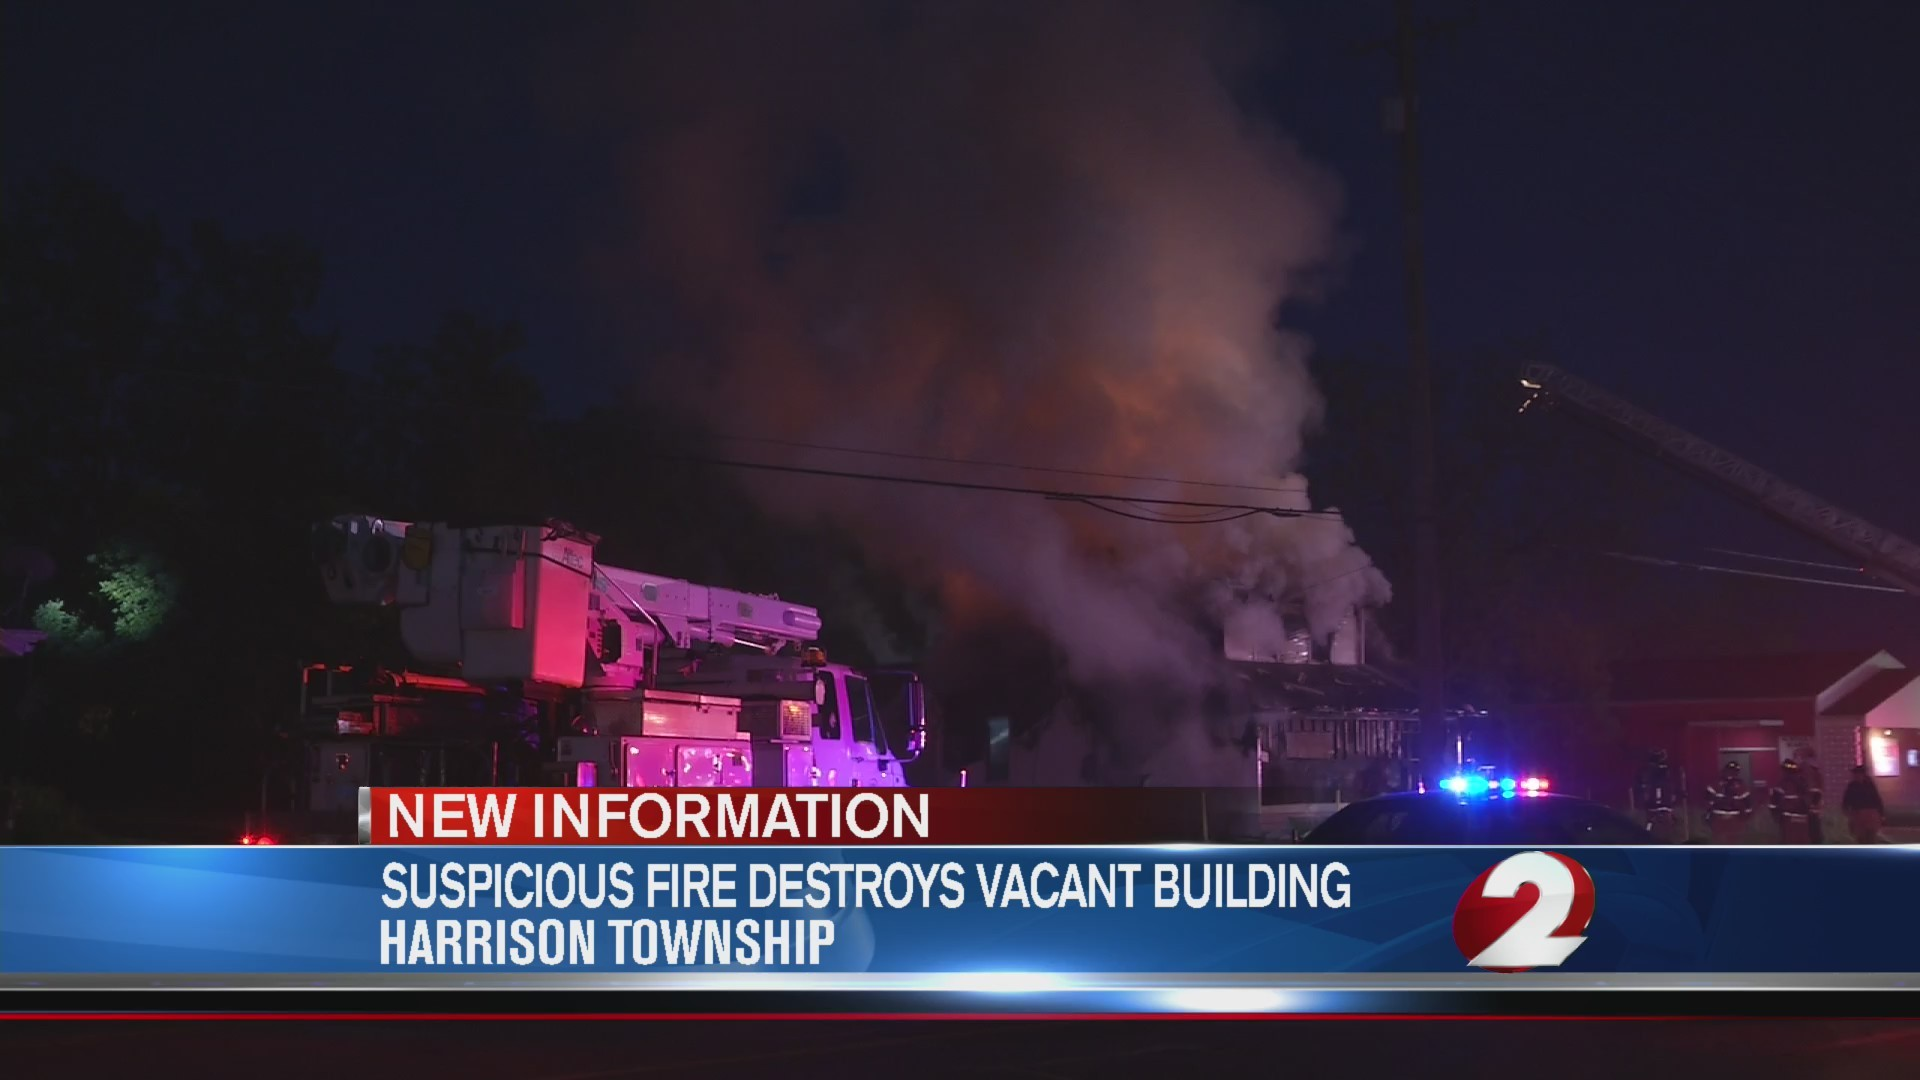 Suspicious fire destroys vacant building